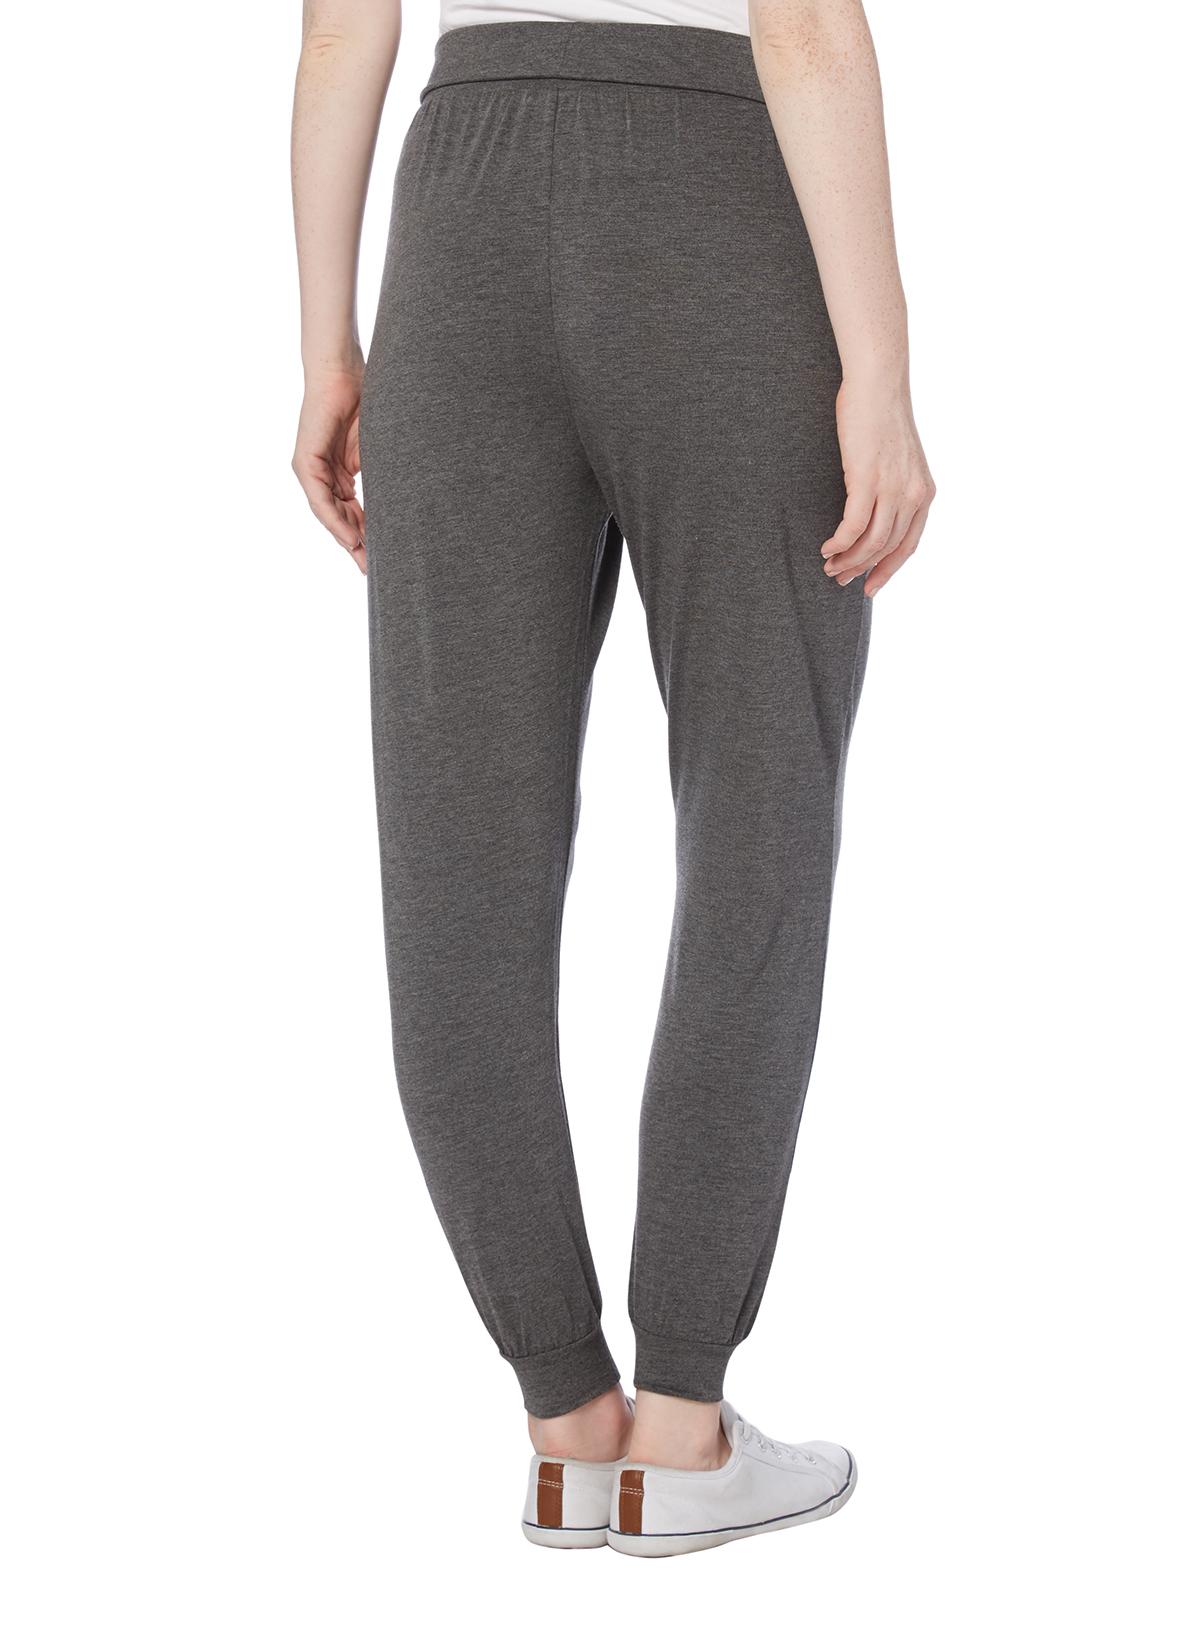 Womens Grey Full Length Yoga Pants | Tu clothing